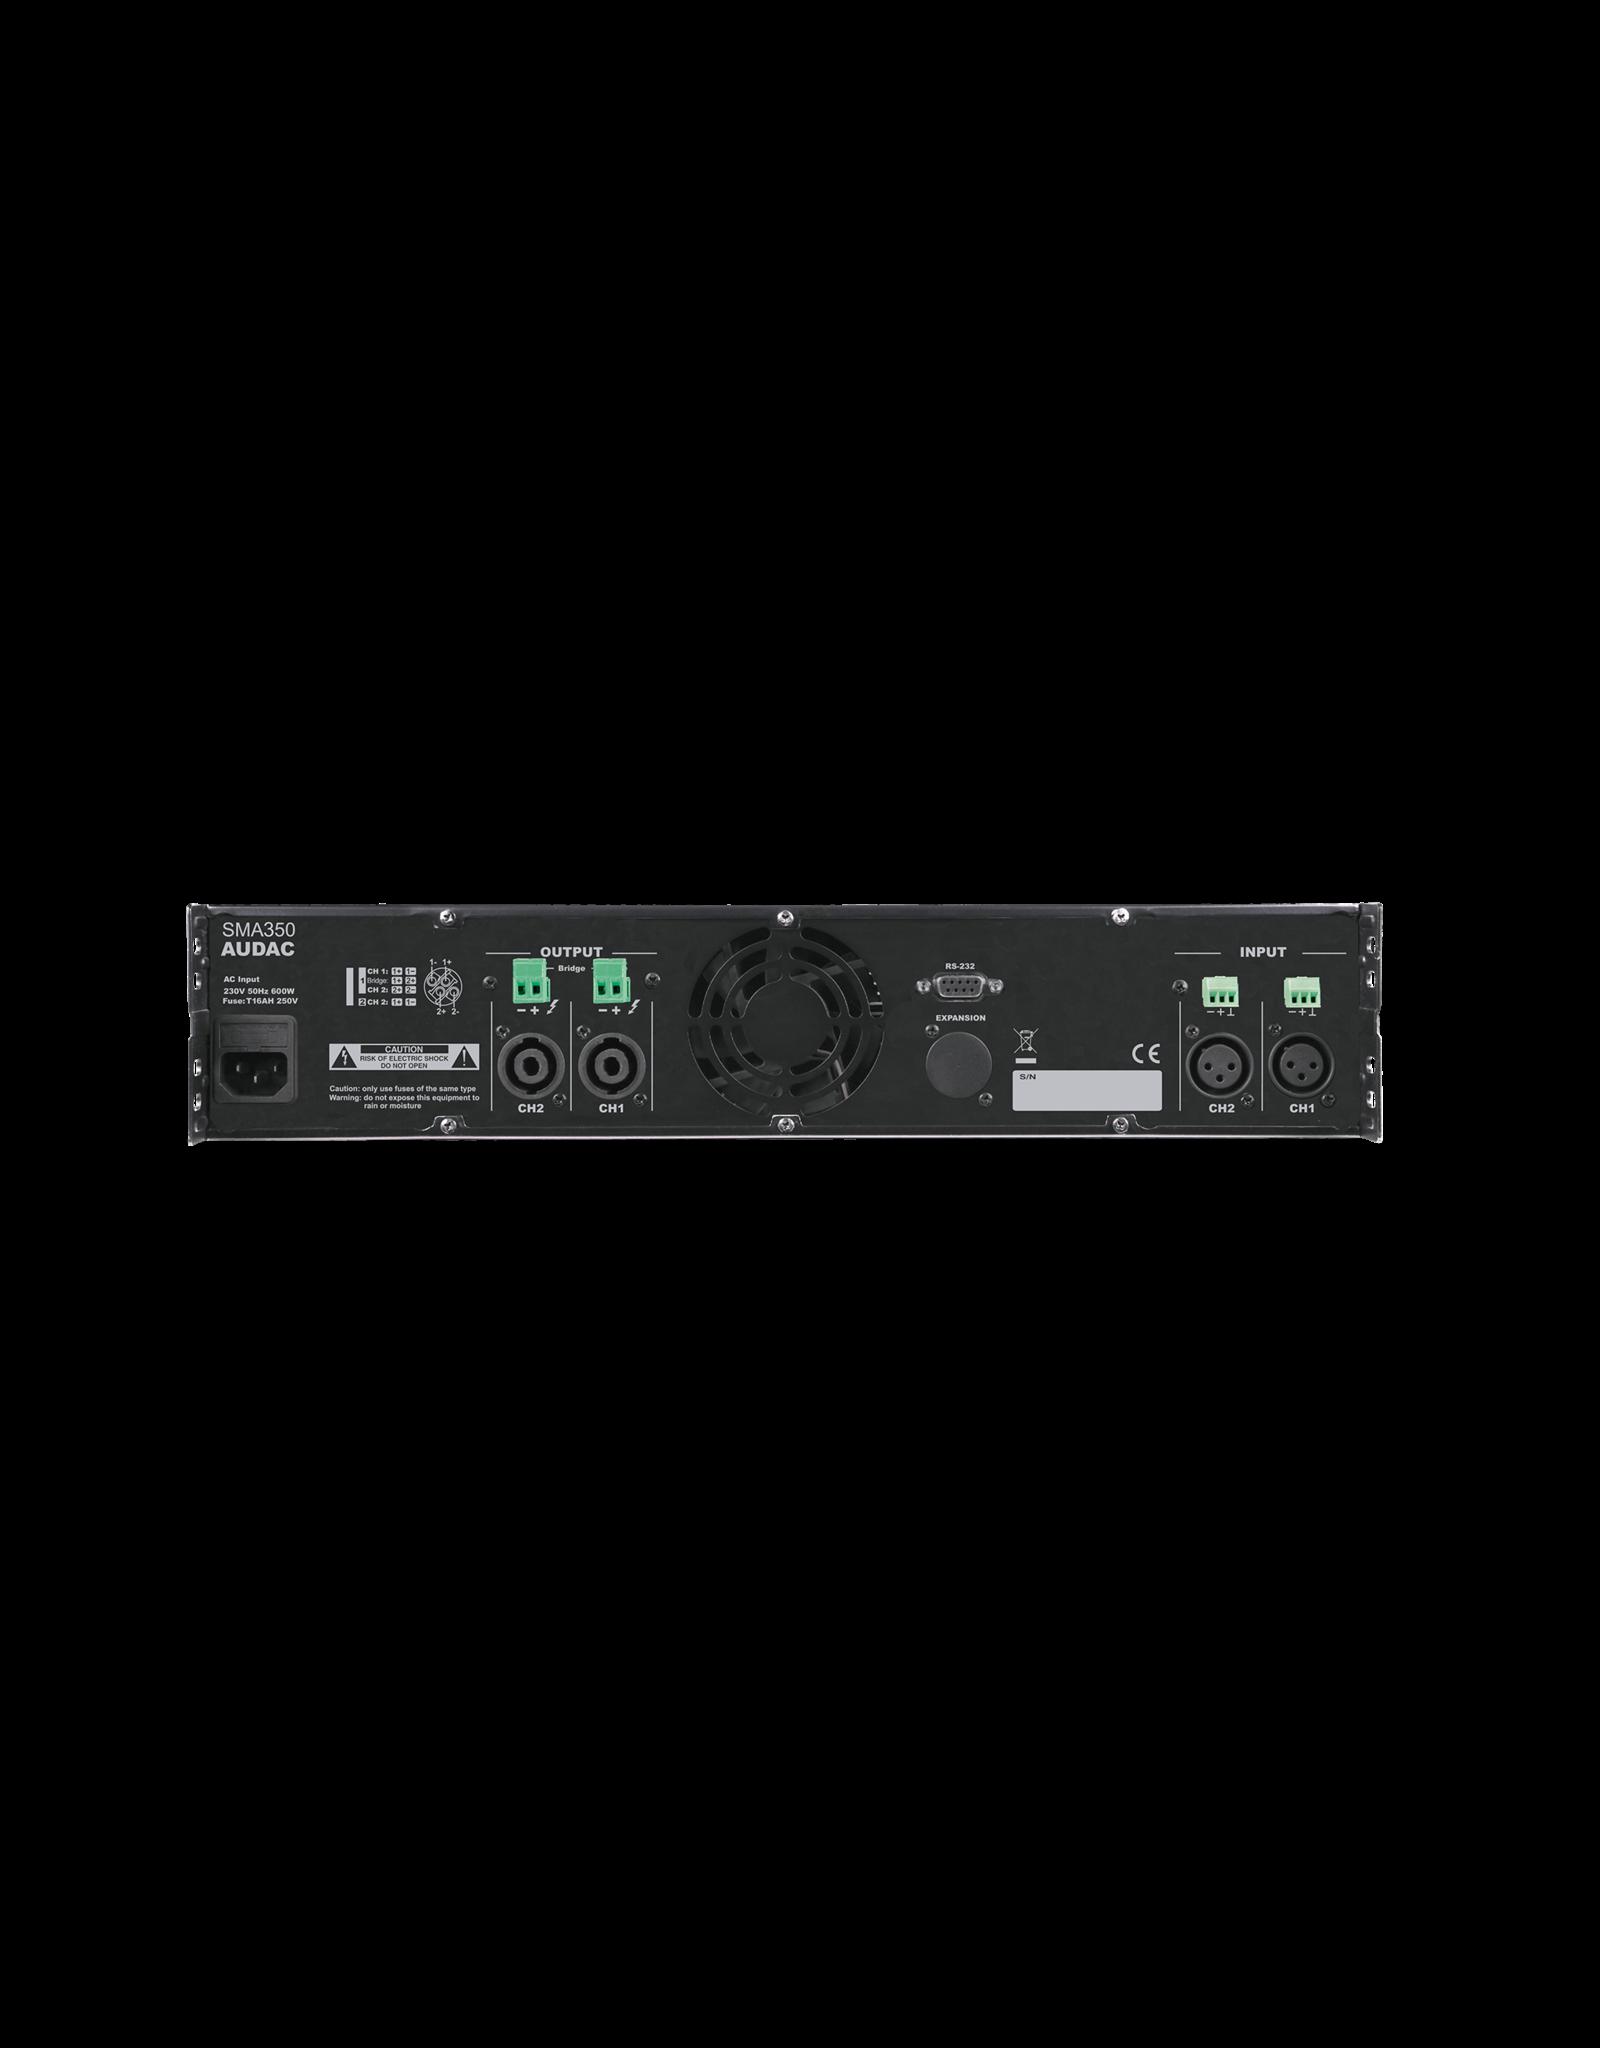 Audac WaveDynamics™ dual-channel power amplifier 2 x 350W